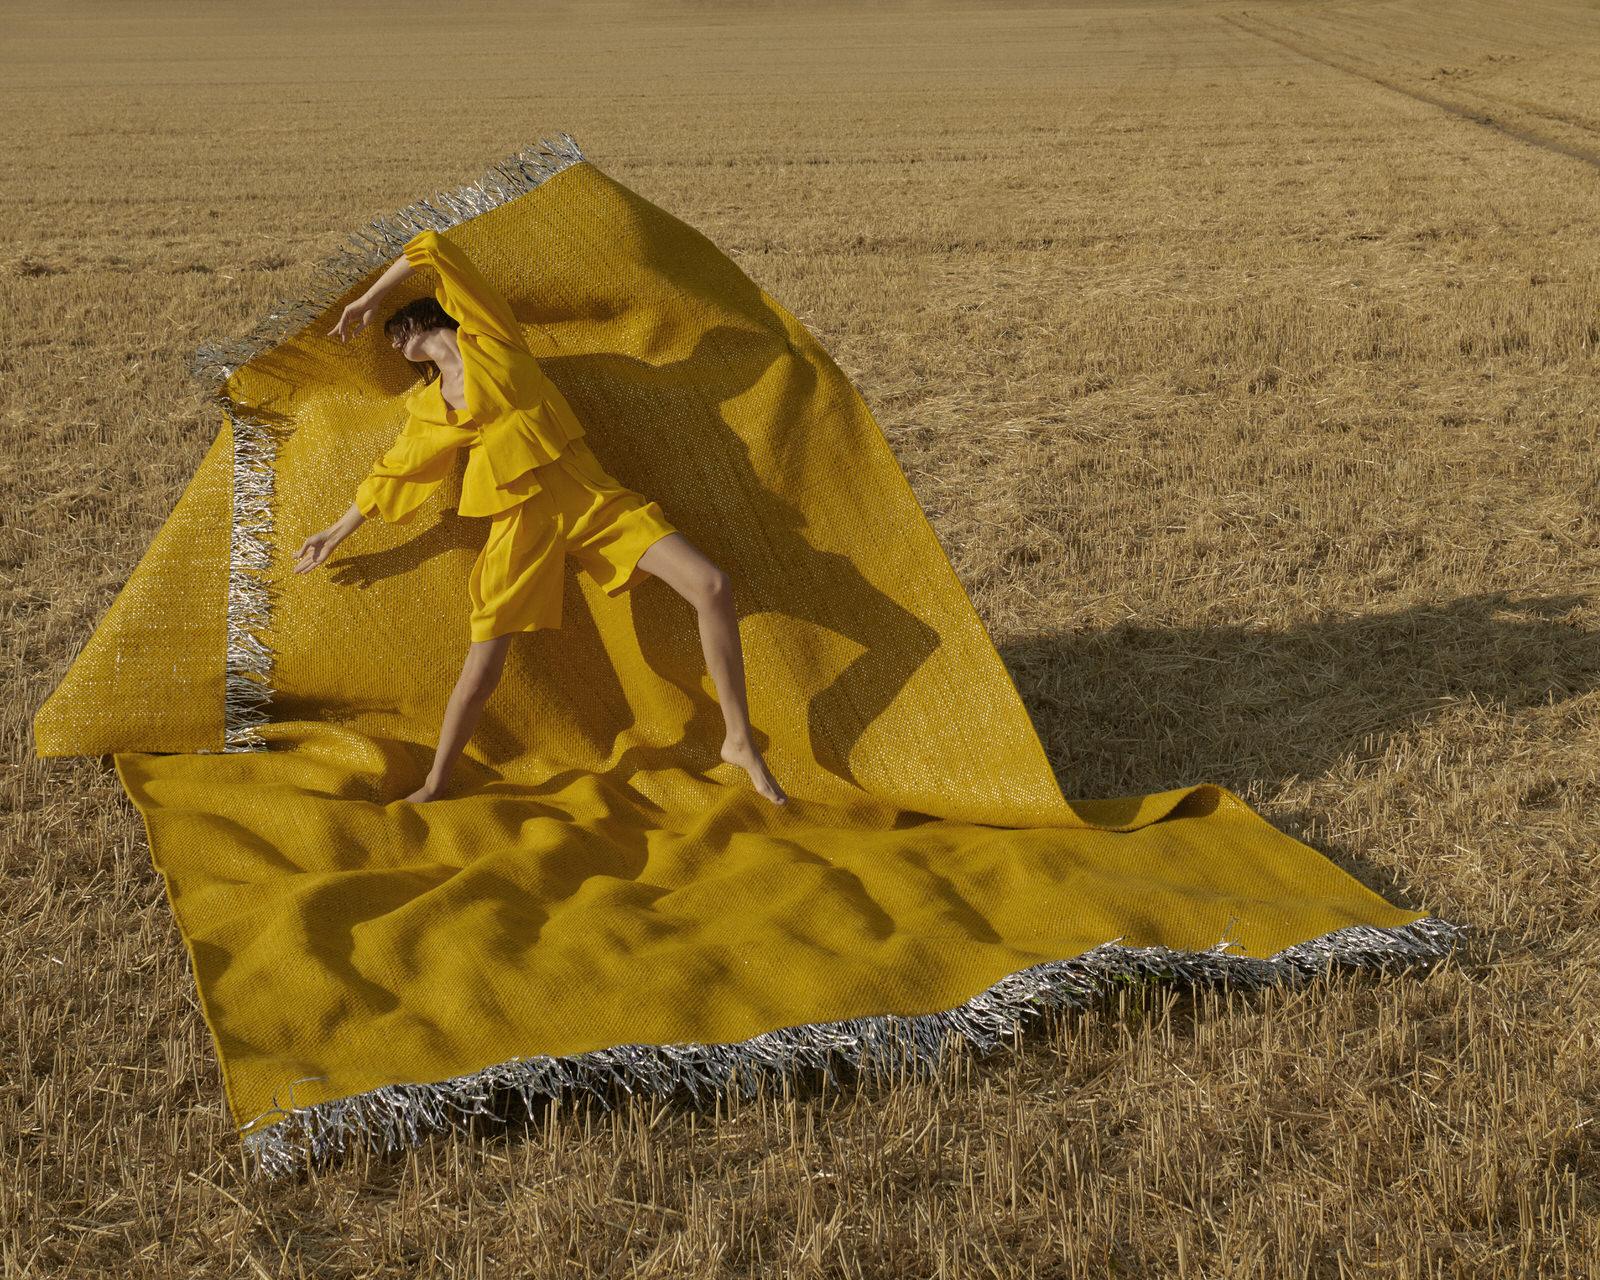 Nomad Rug By Jutta Werner Photo Anna Daki Yellowtrace 01